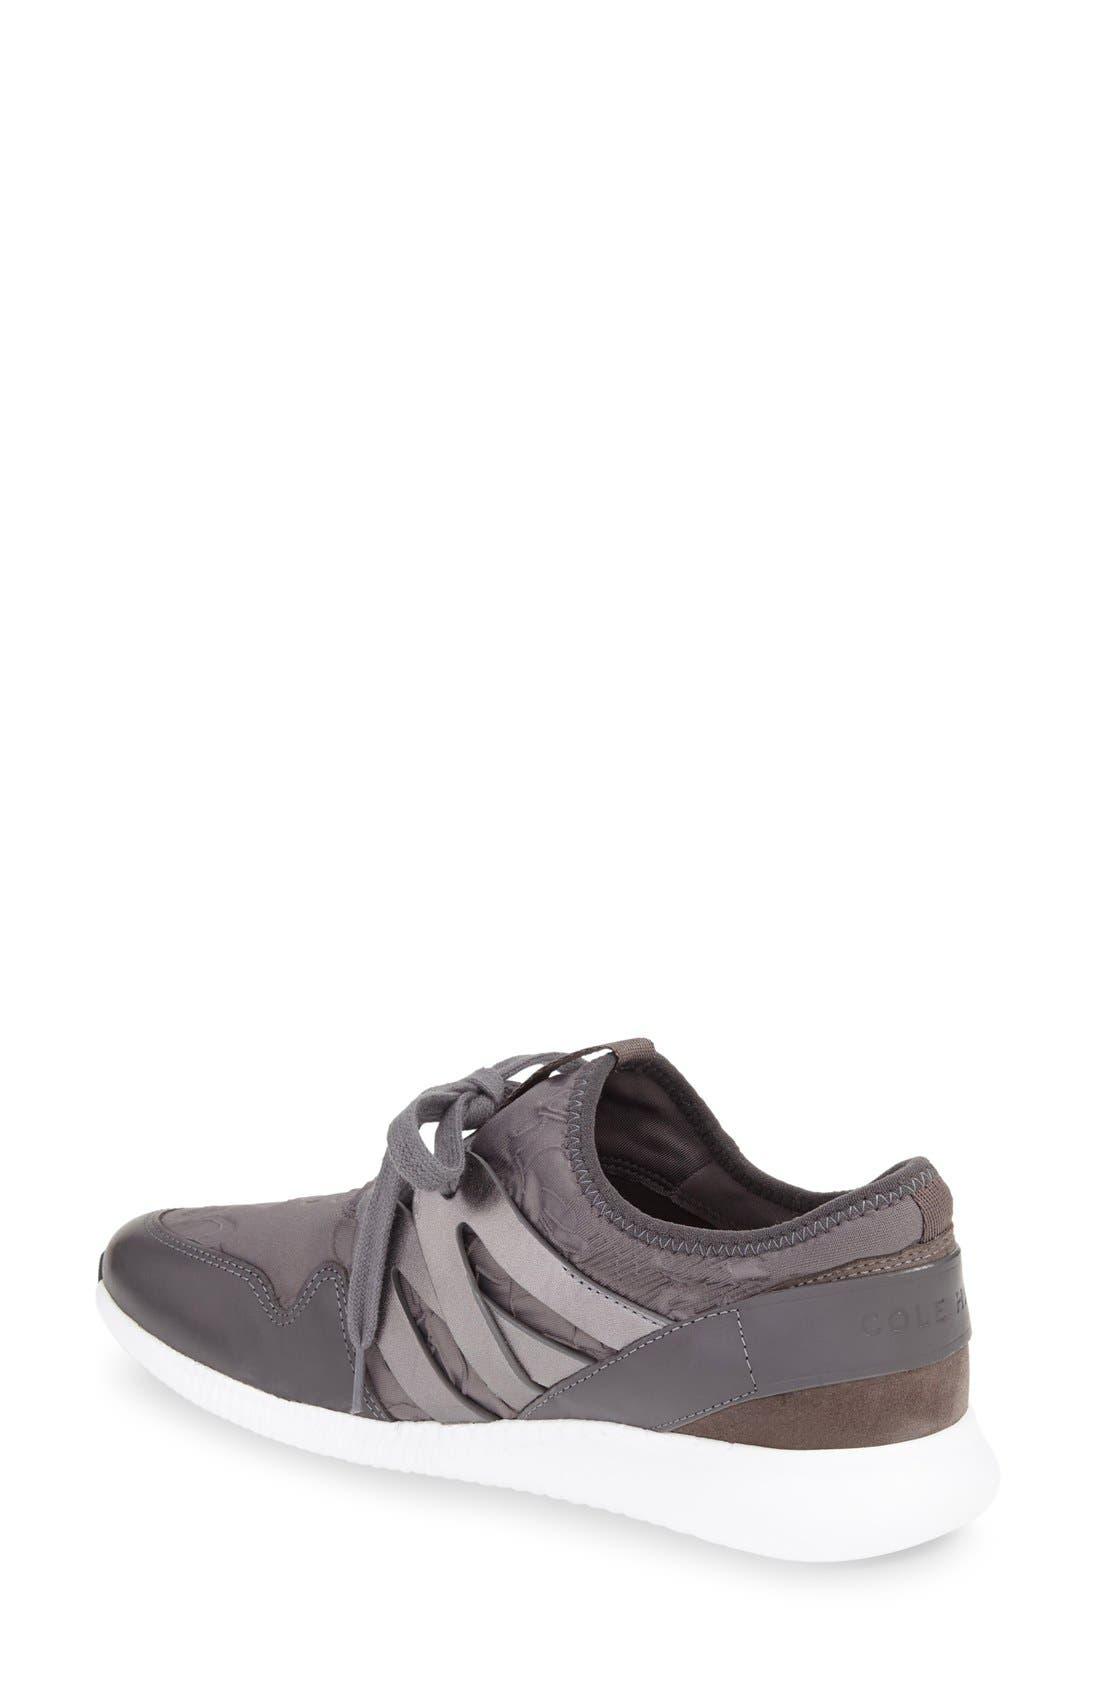 'StudioGrand' Sneaker,                             Alternate thumbnail 13, color,